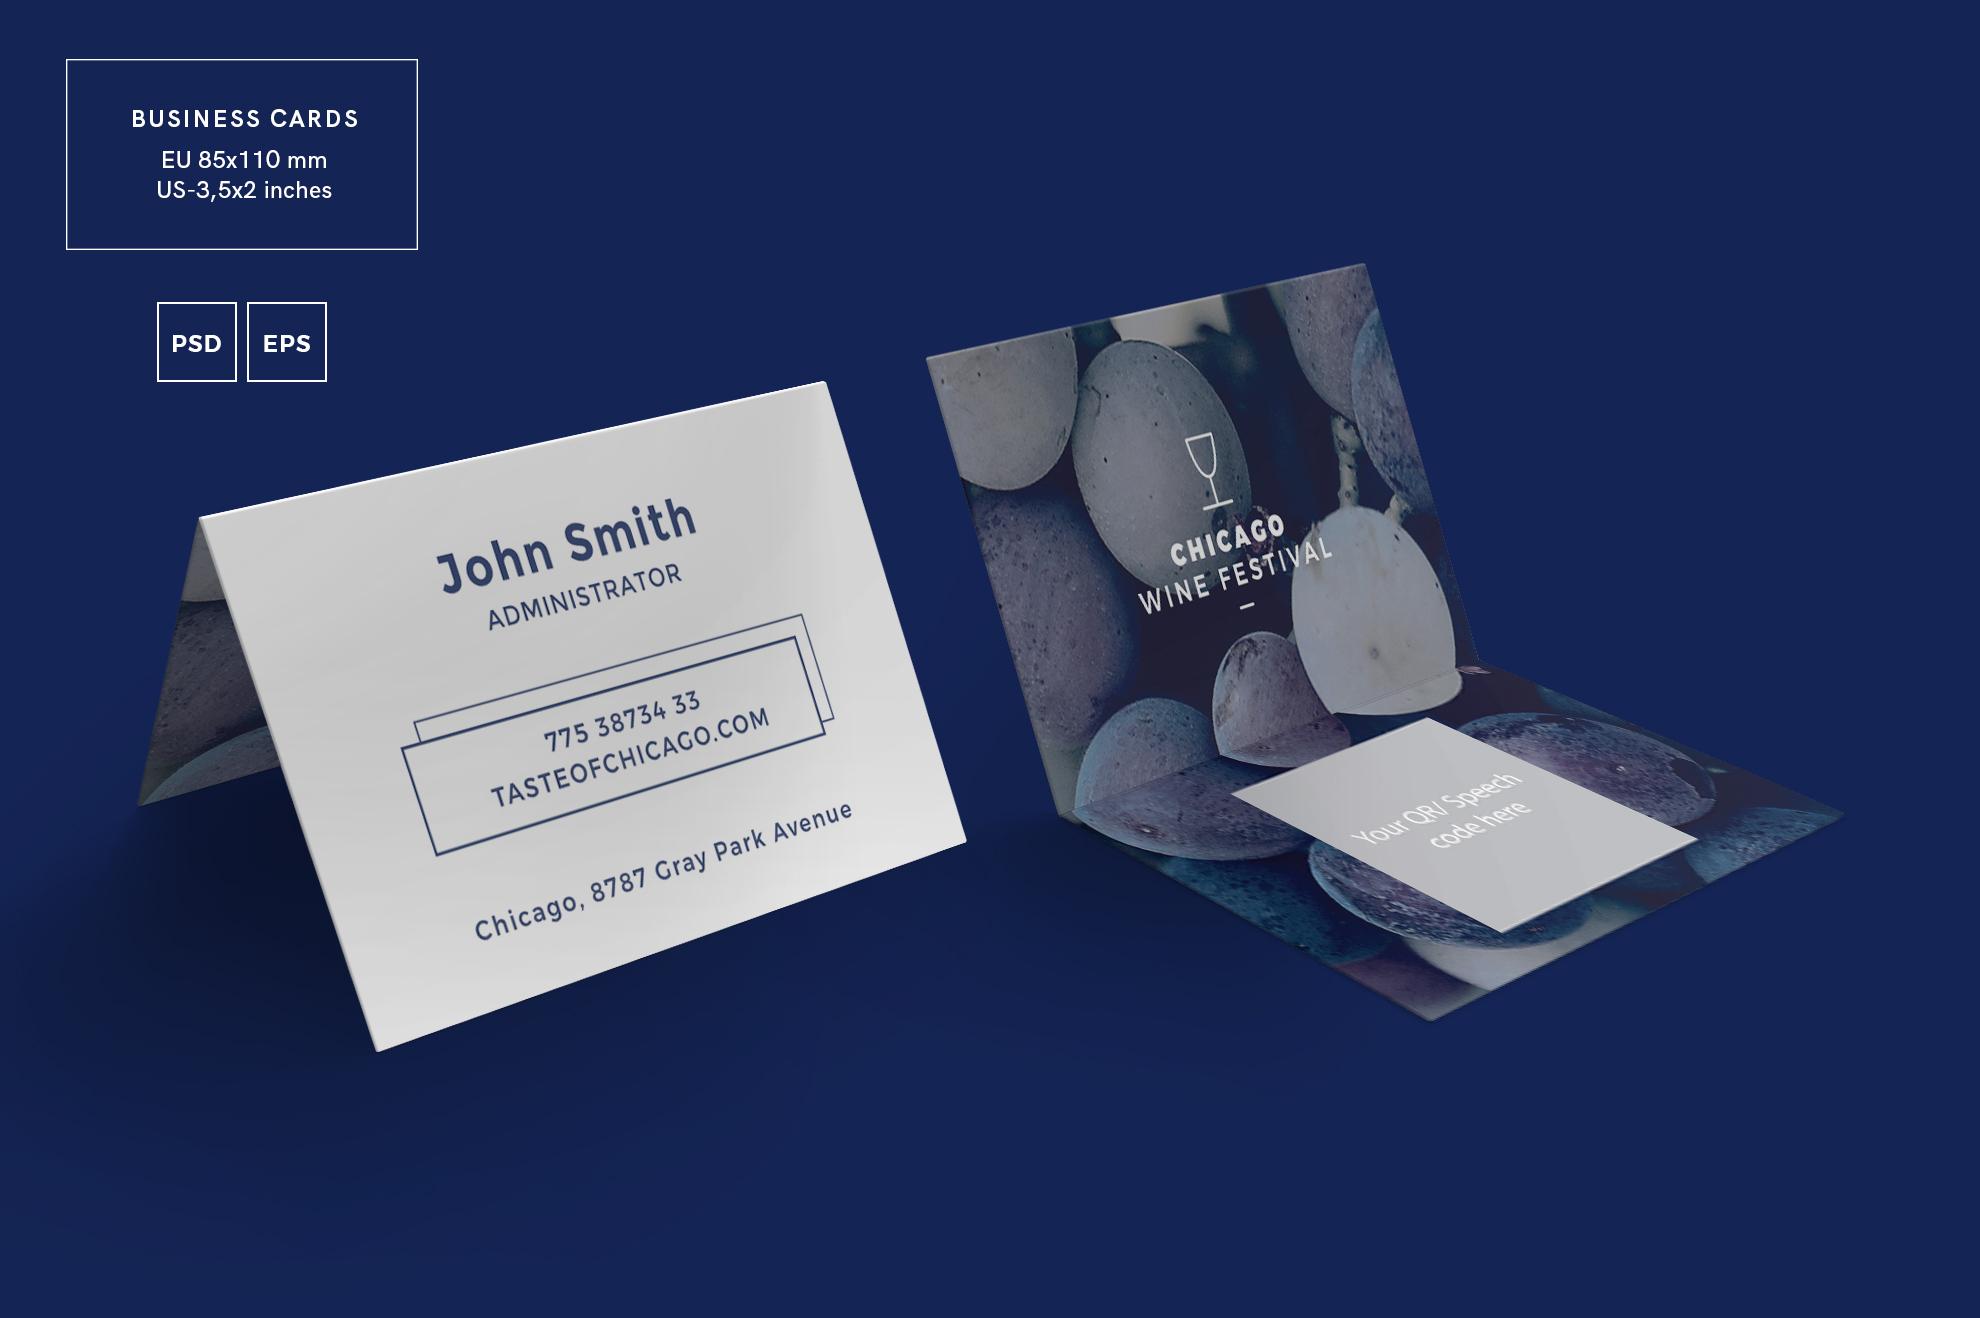 Wine Festival Business Card Design Temp | Design Bundles